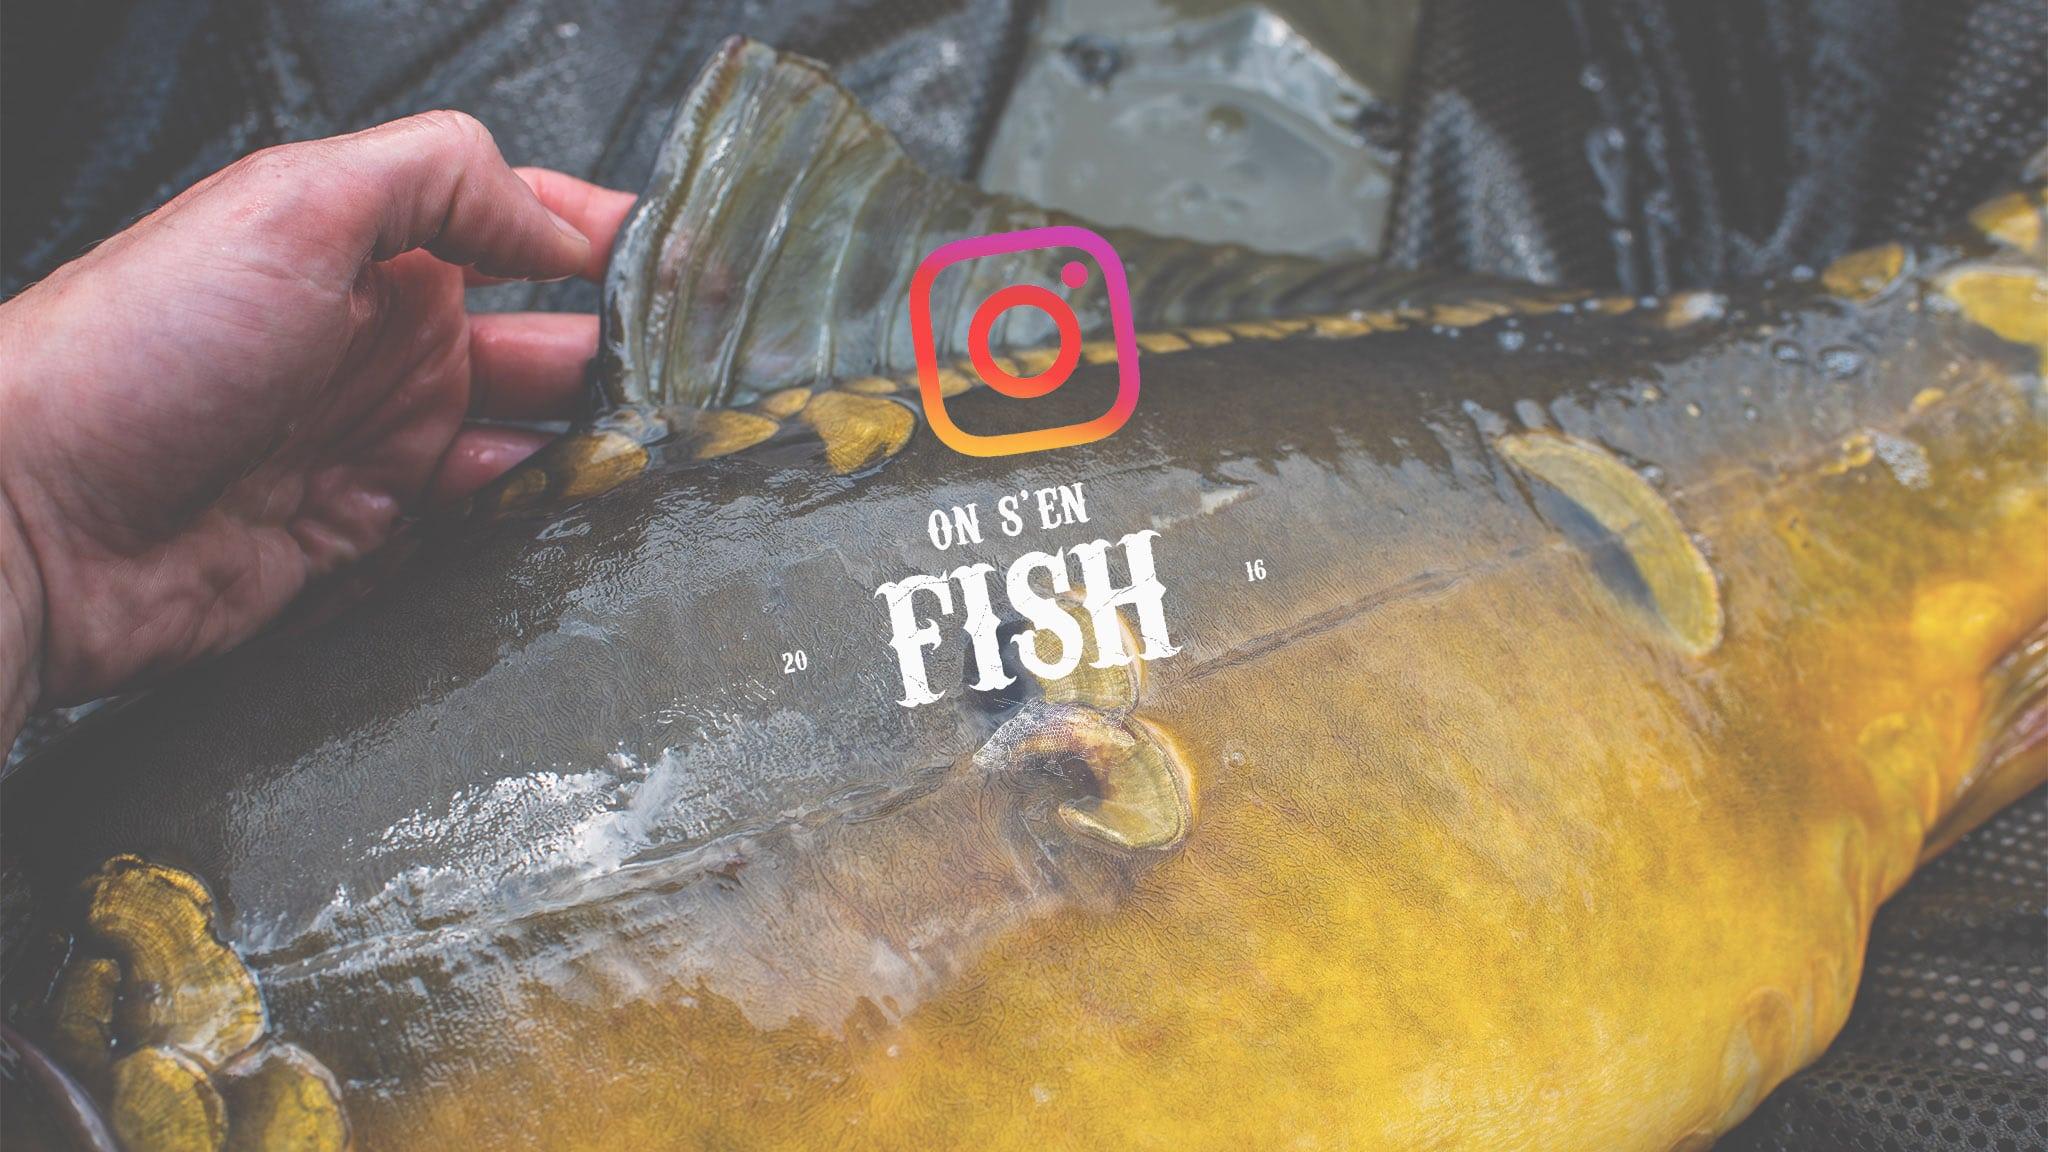 on-s-en-fish-header-carpstagram-26